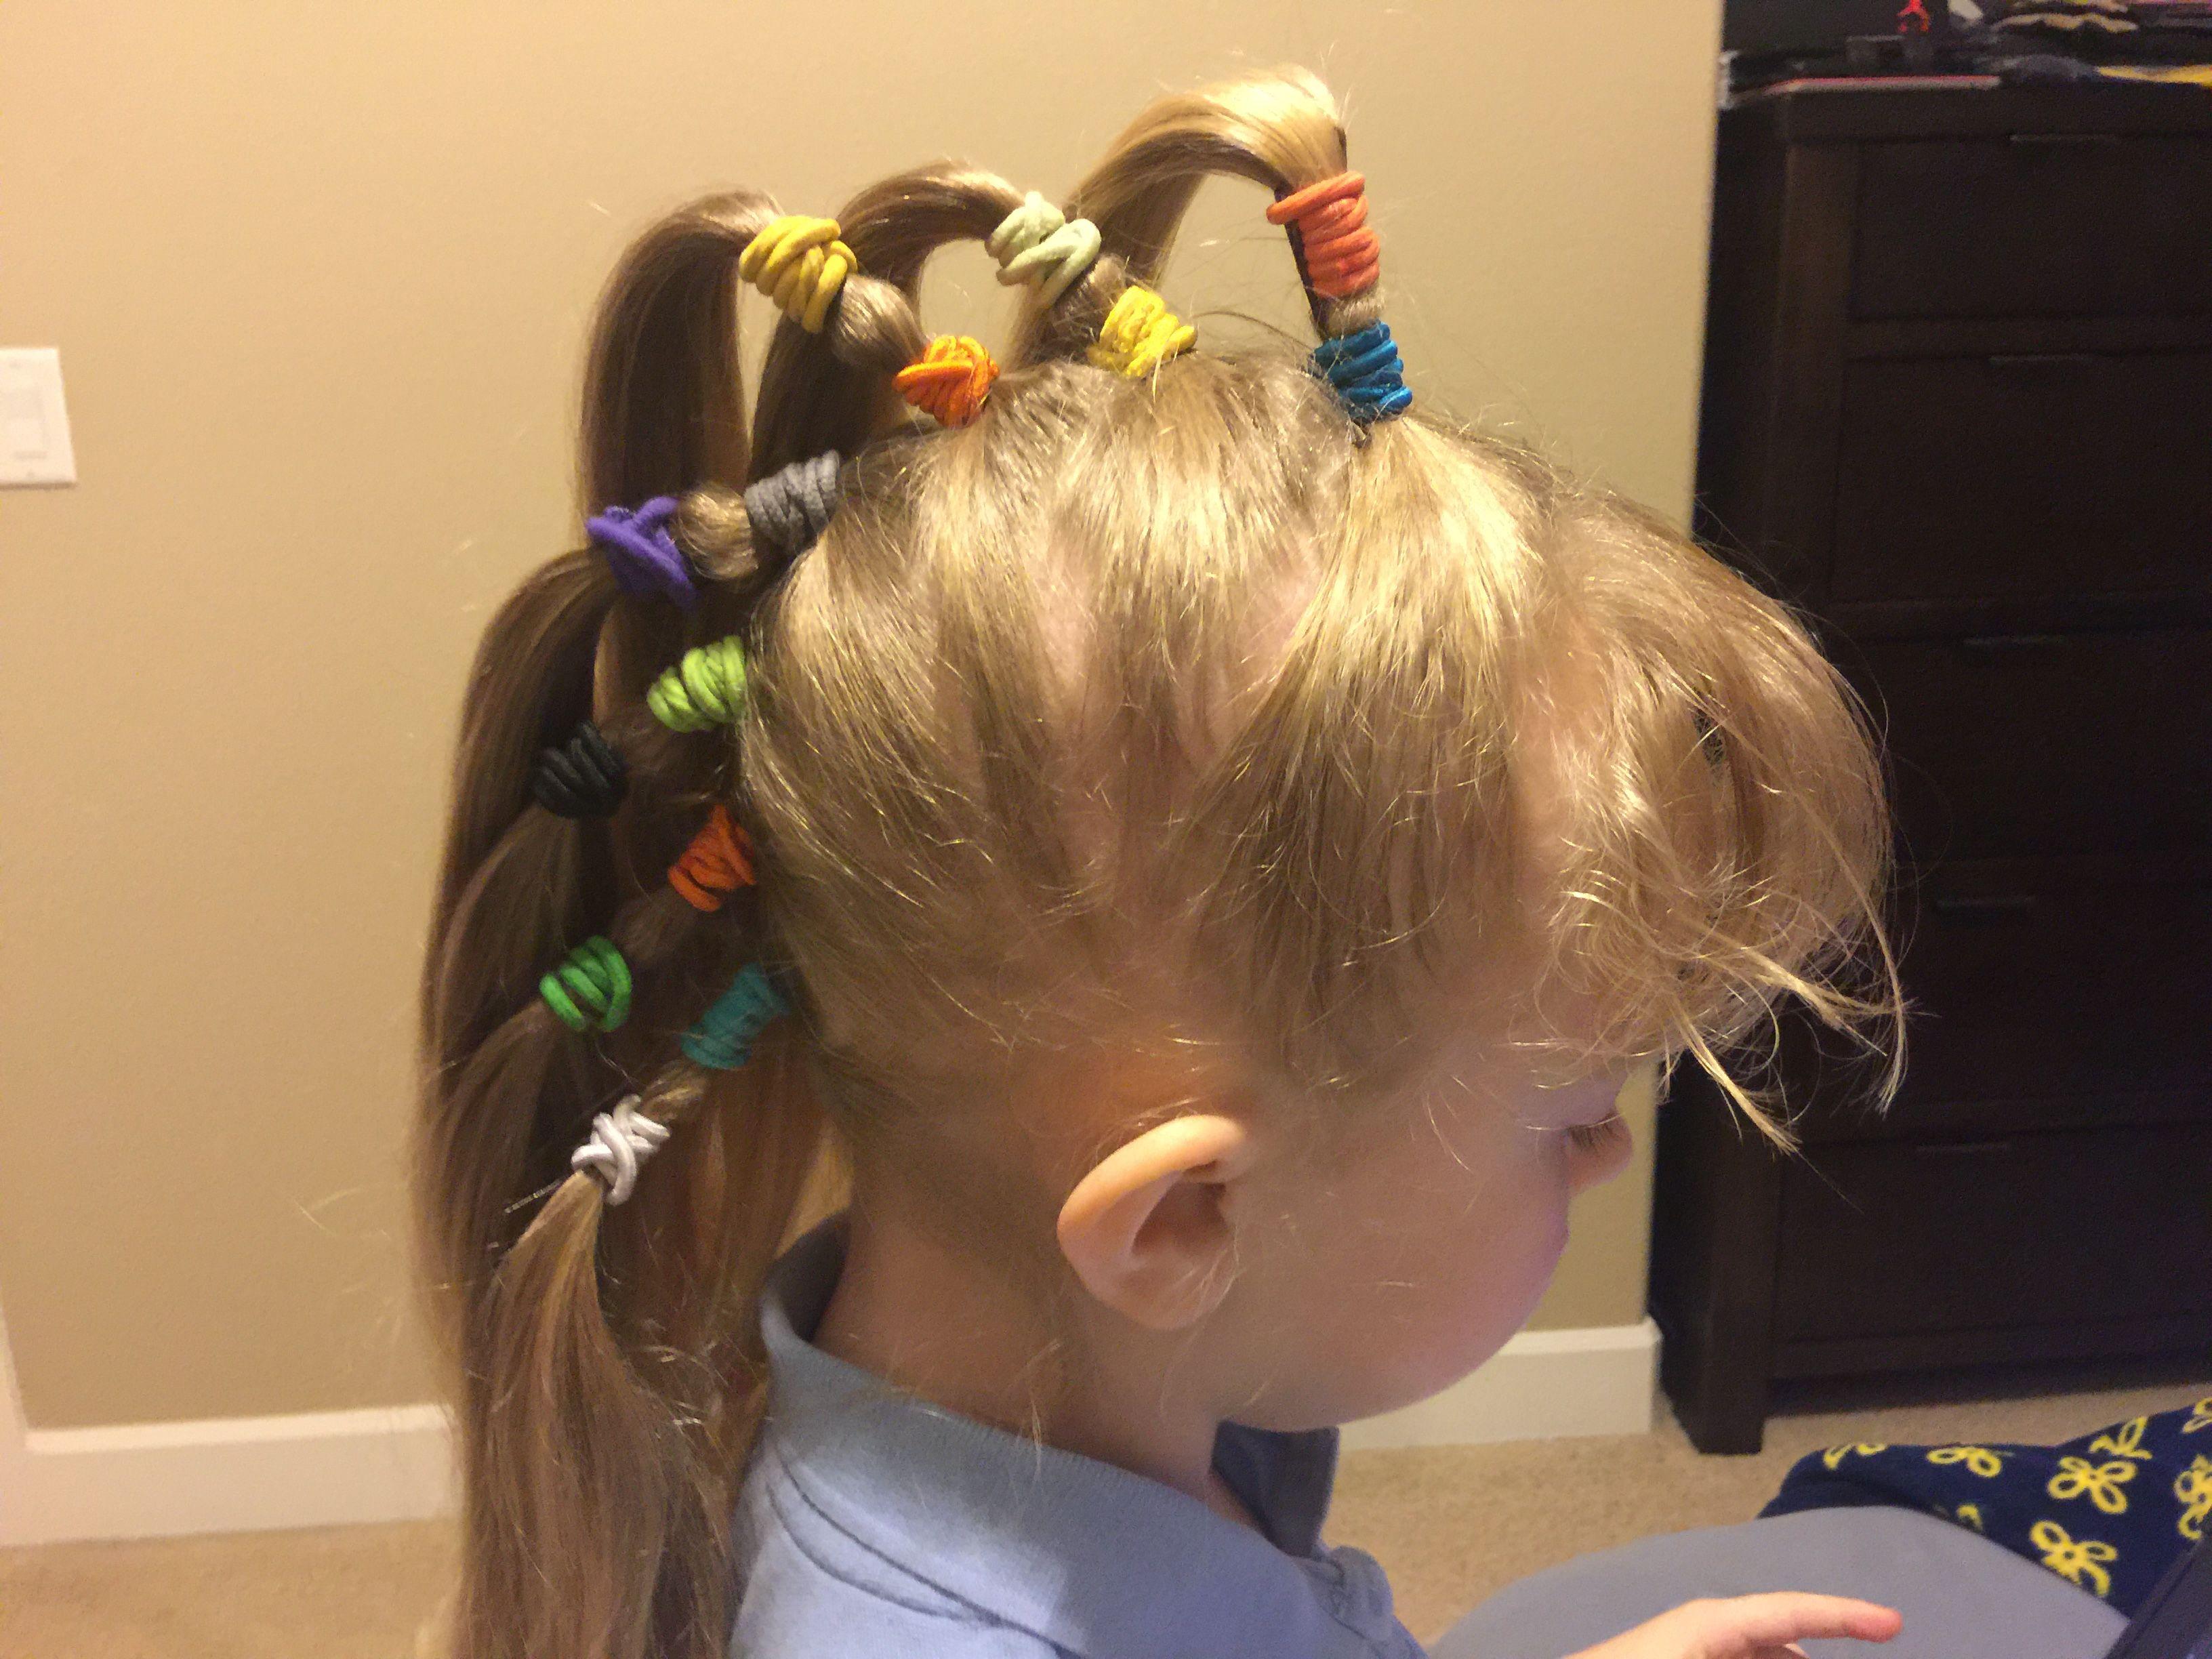 Crazy Hair Day At School 1st Grade Wacky Hair Days Crazy Hair Day At School Crazy Hair Days